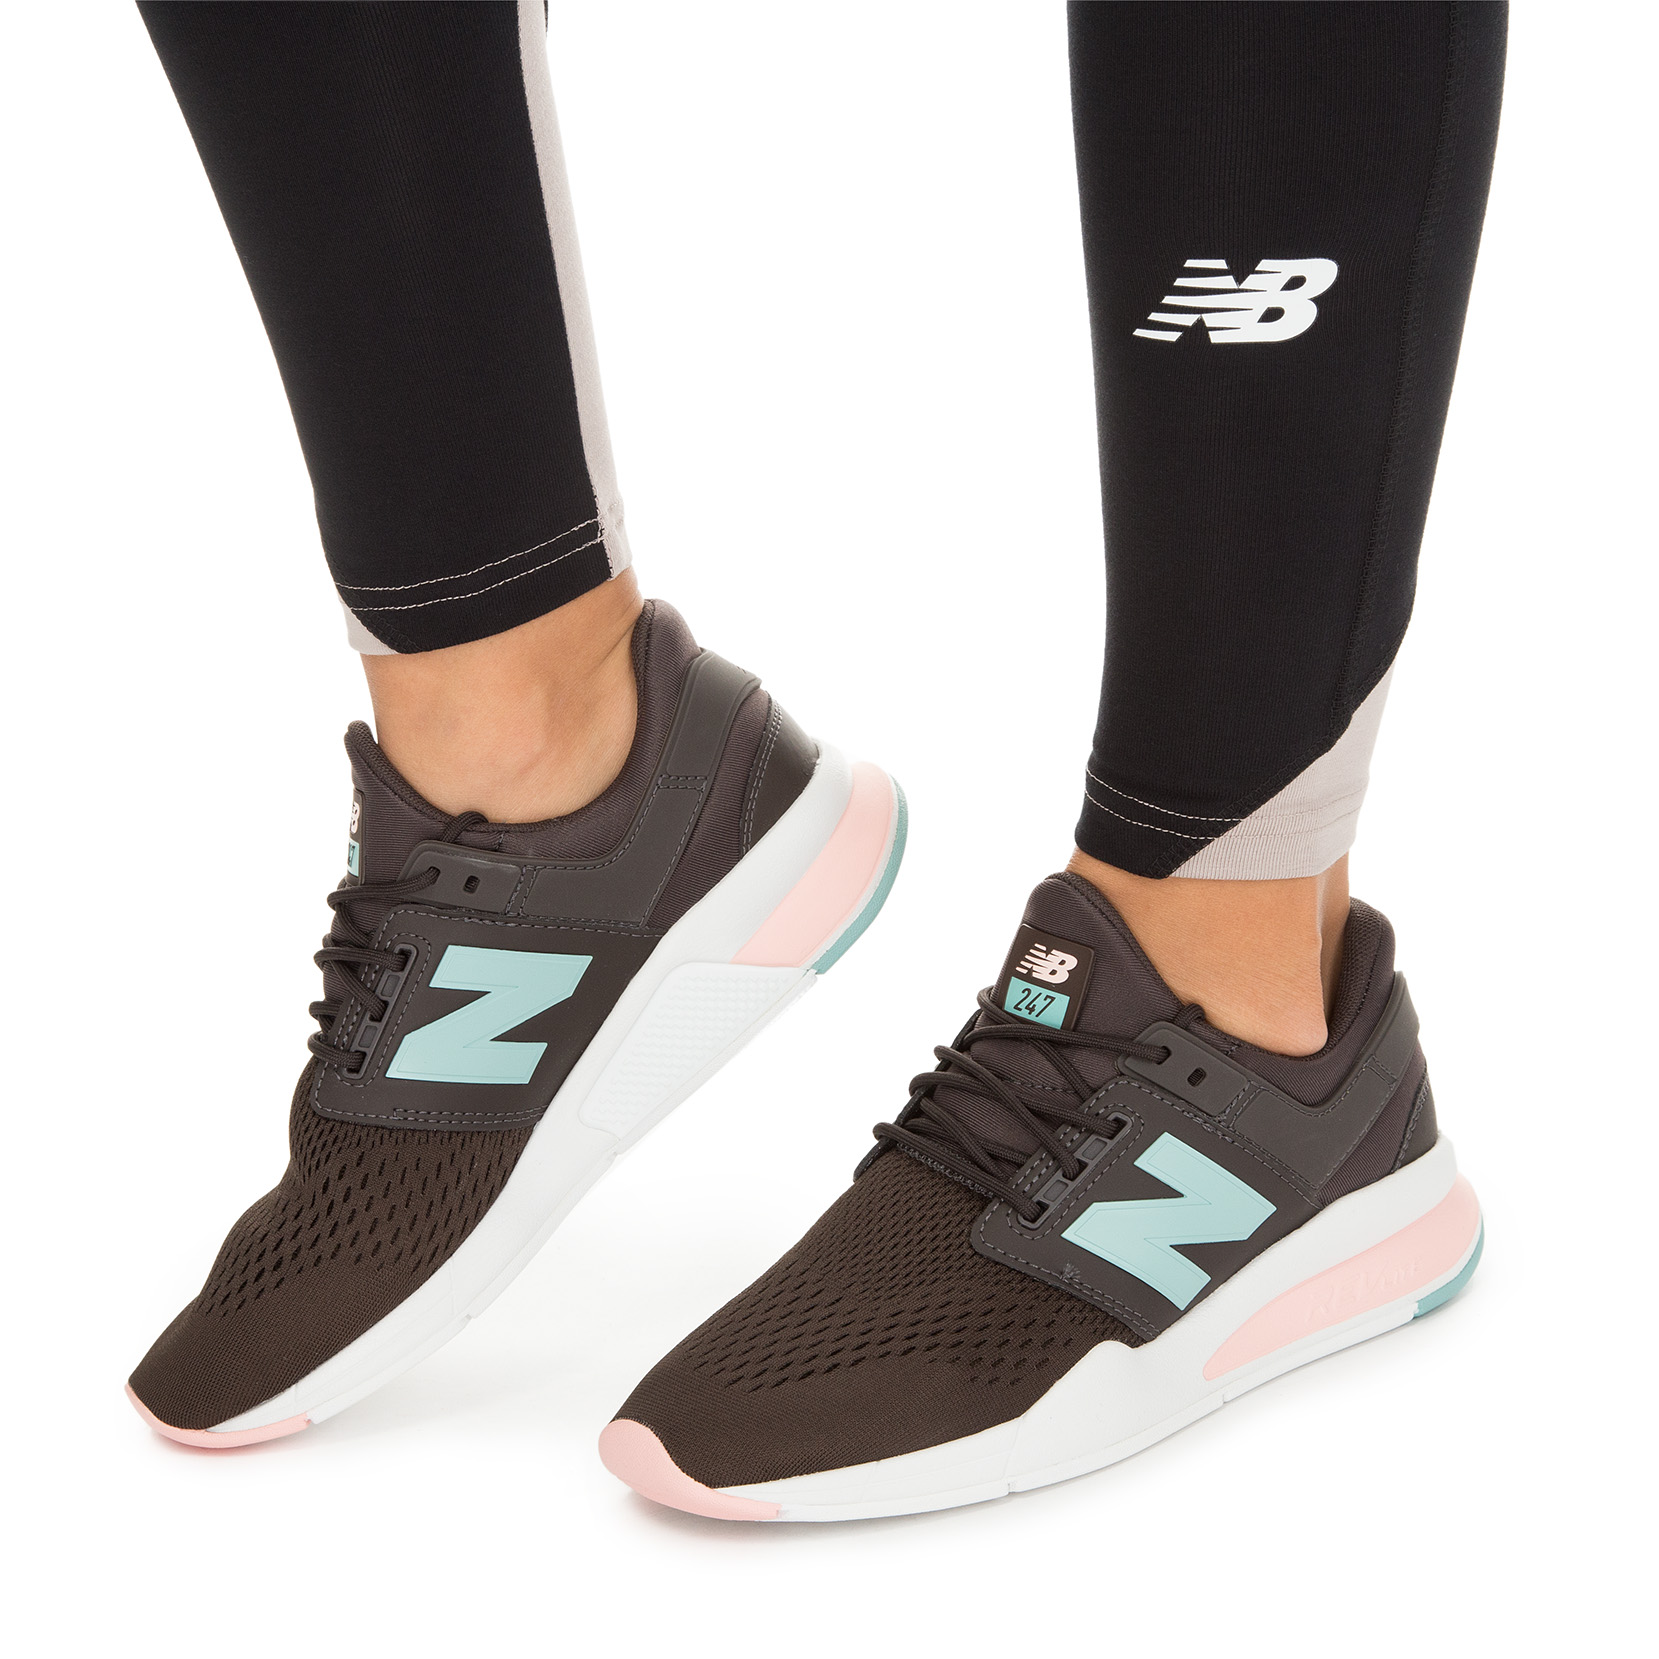 Жіноче взуття повсякденне New Balance 247 Tritium WS247FD | New Balance